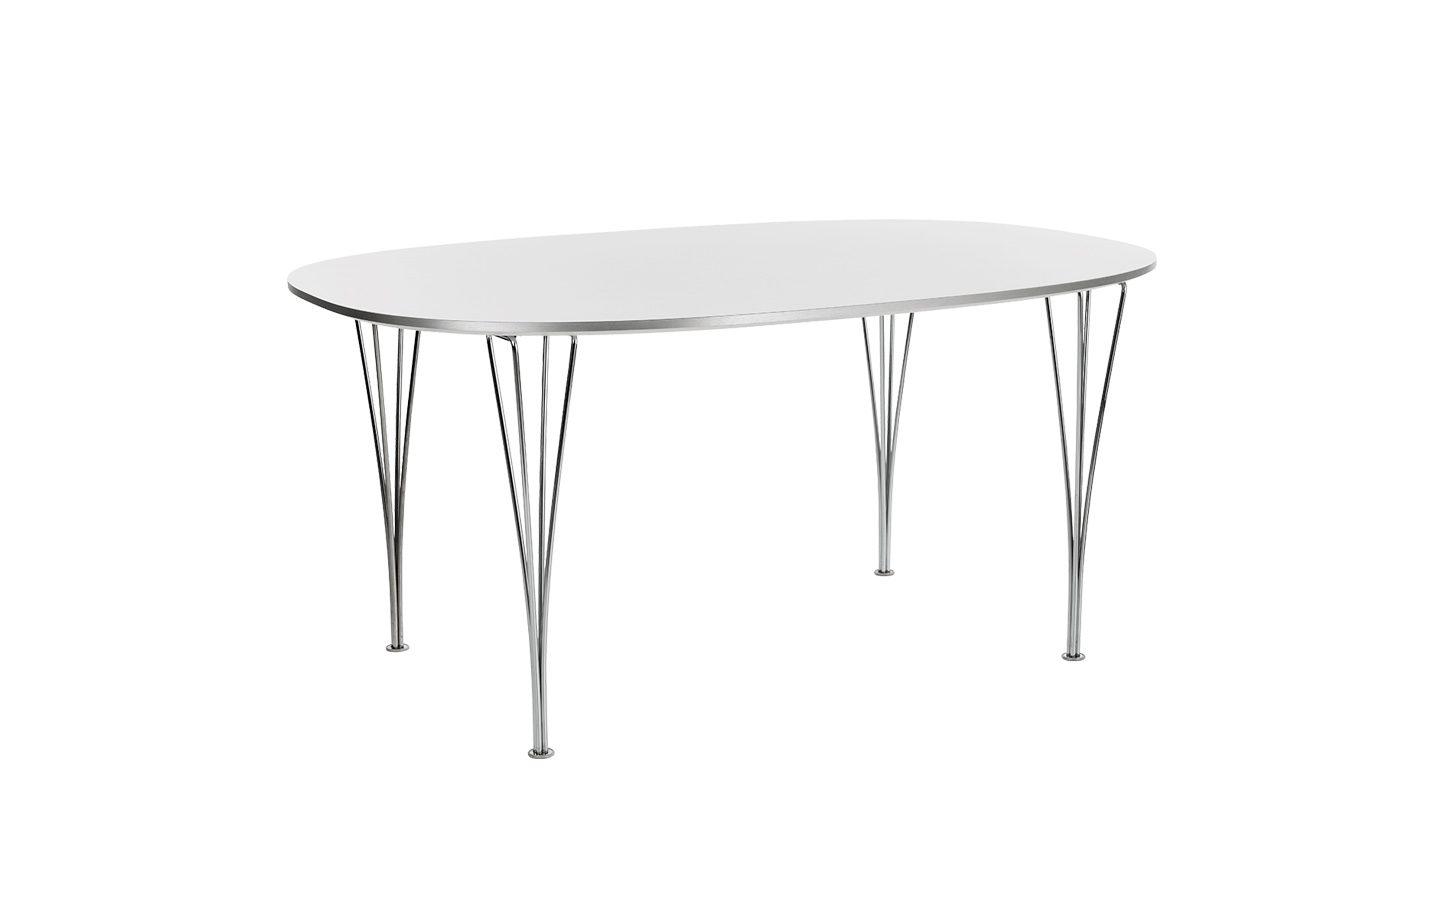 Super-Elliptical-Series-table-White